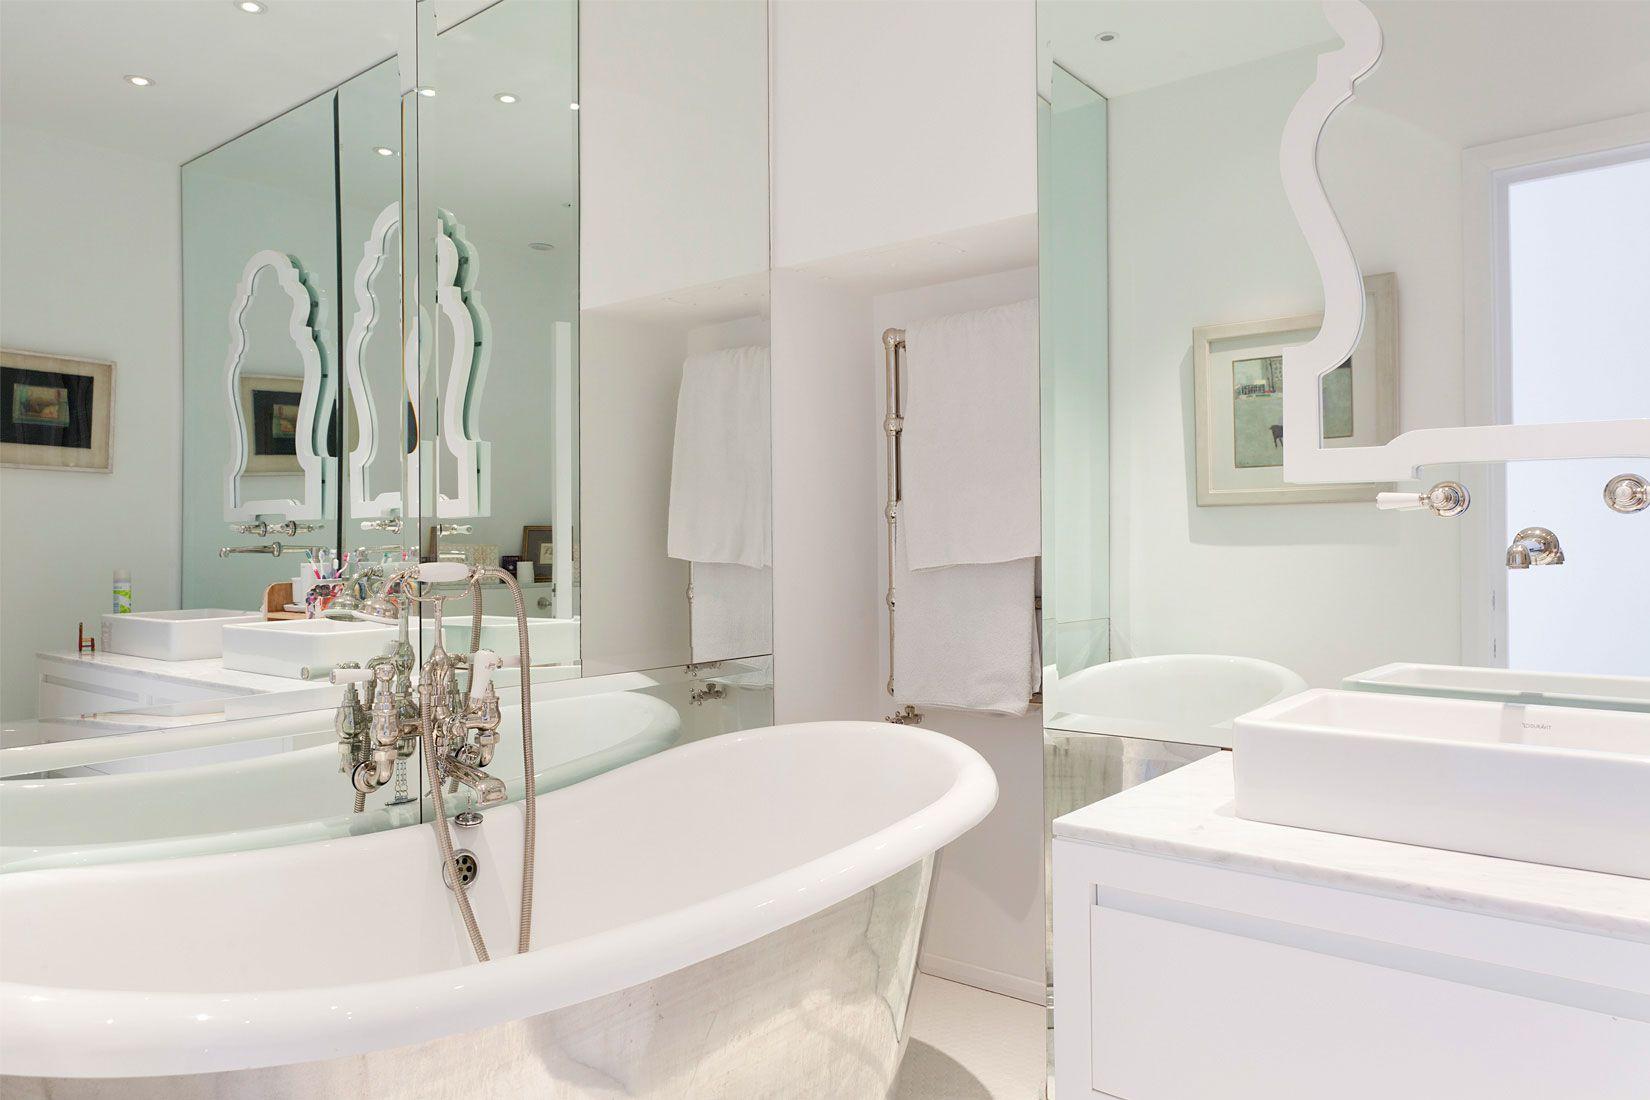 Marble Bathroom With Awesome Design Ideas | Pinterest | Bathroom designs